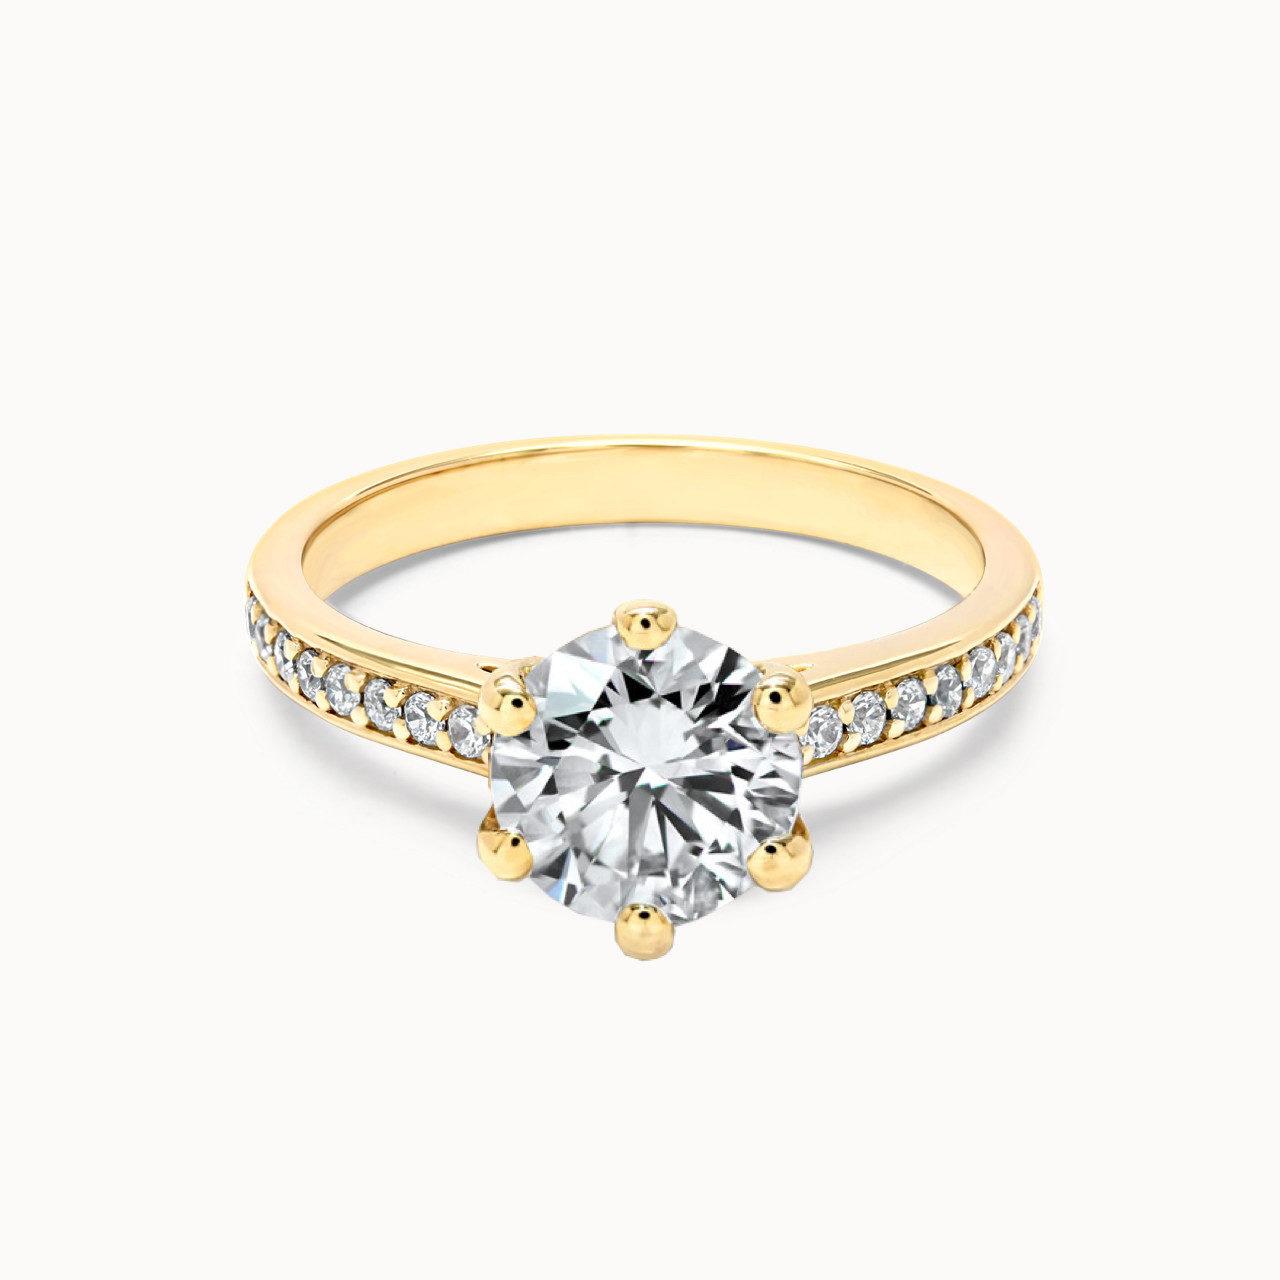 Pavee Ring aus Gelbgold mit 1.25 Karat Diamant